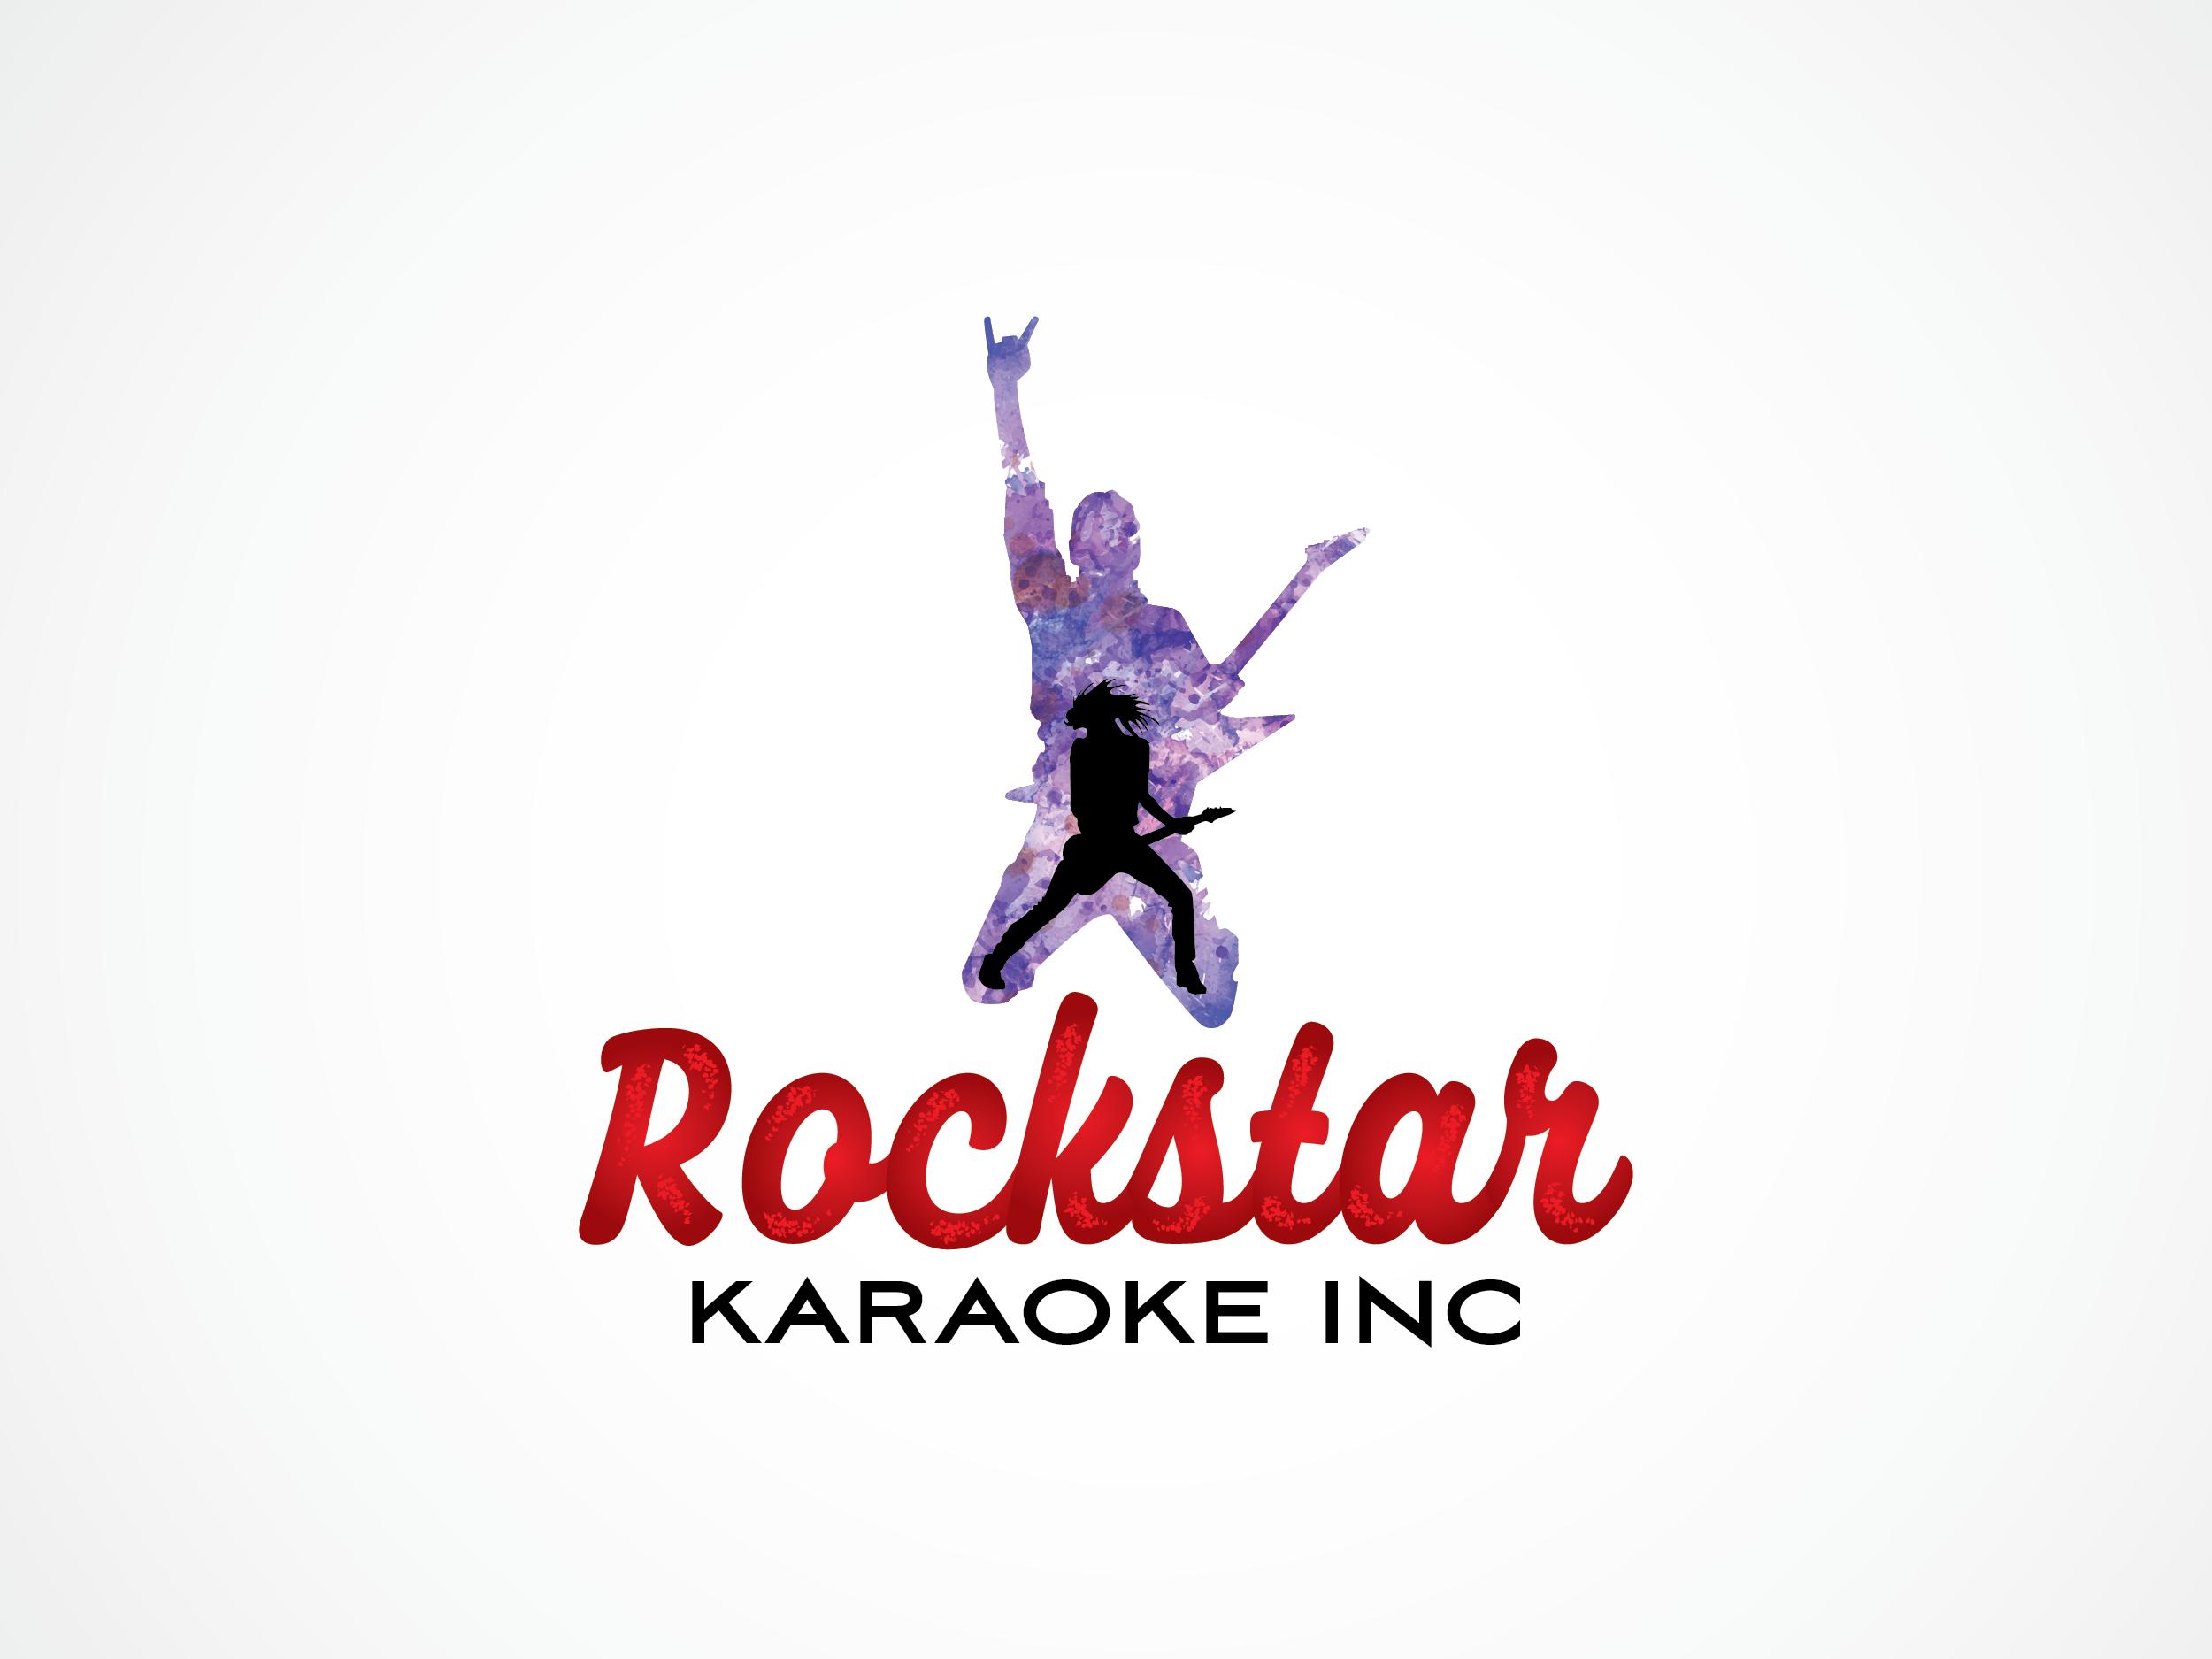 Logo Design by Shahab Uddin - Entry No. 14 in the Logo Design Contest Fun Logo Design for Rockstar Karaoke, Inc..